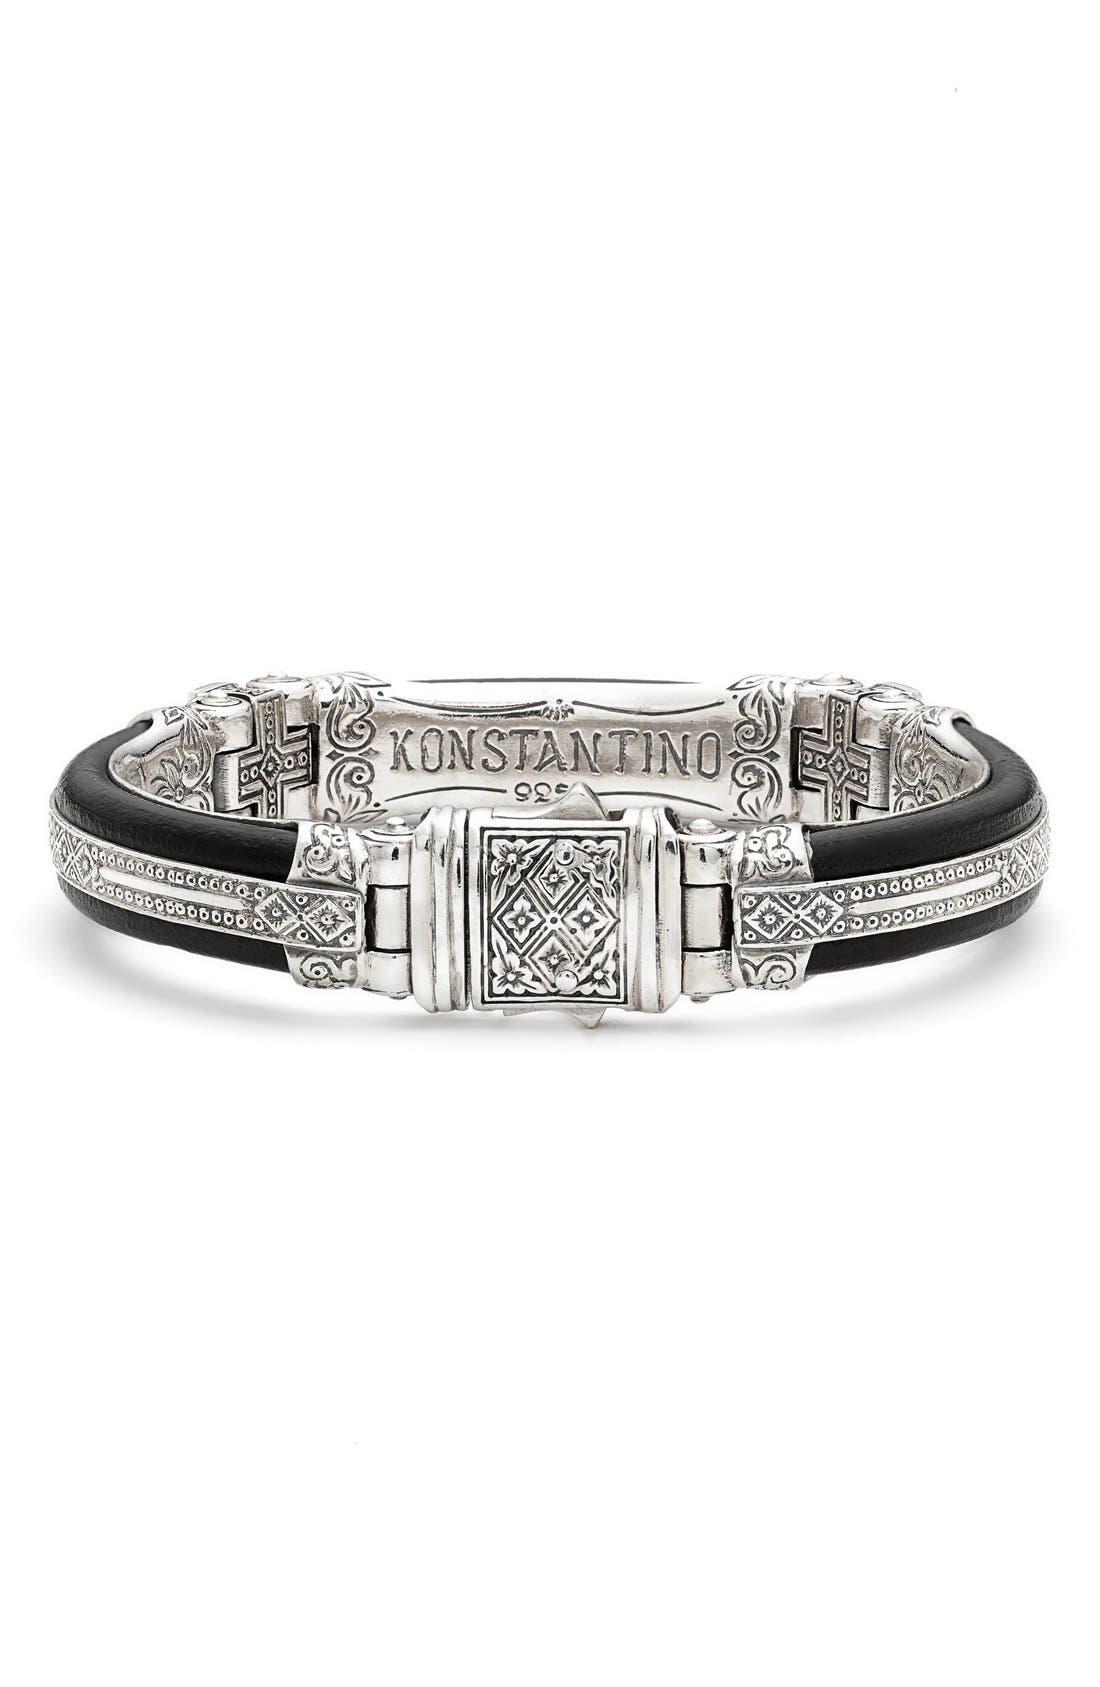 Plato Etched Sterling Silver & Leather Bracelet,                             Alternate thumbnail 2, color,                             Silver